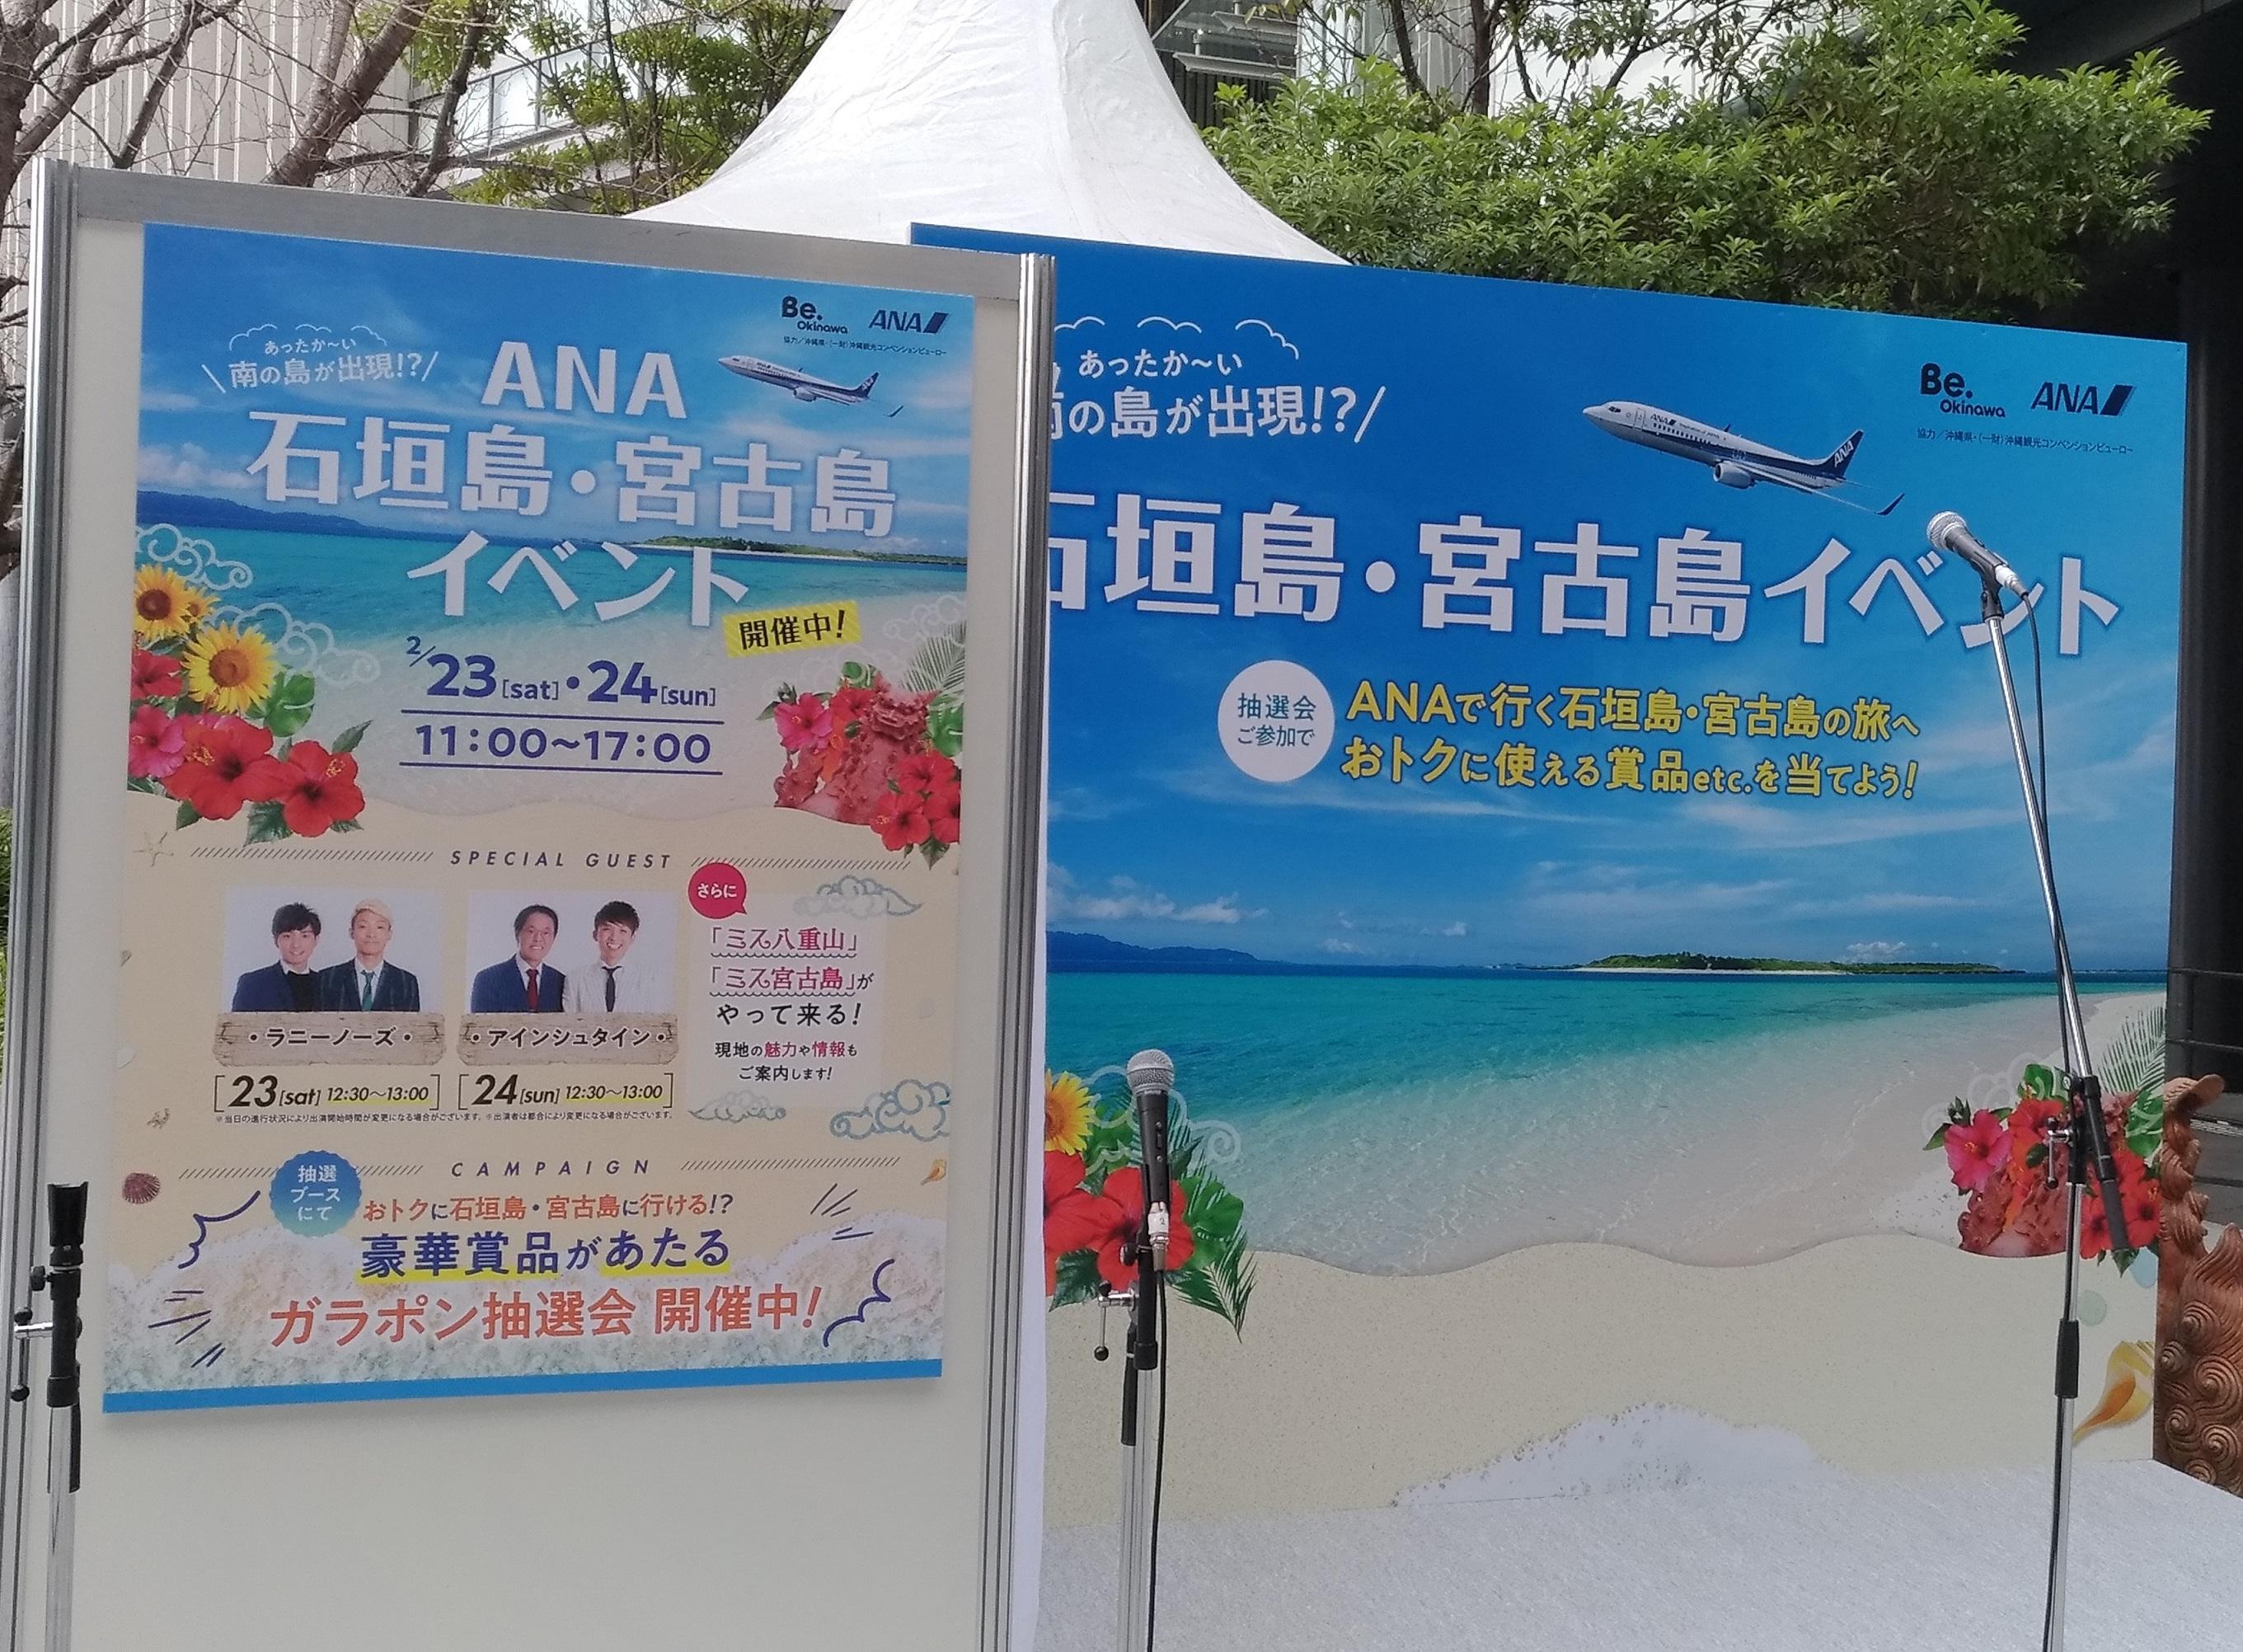 osaka_umeda_ana_events.jpg